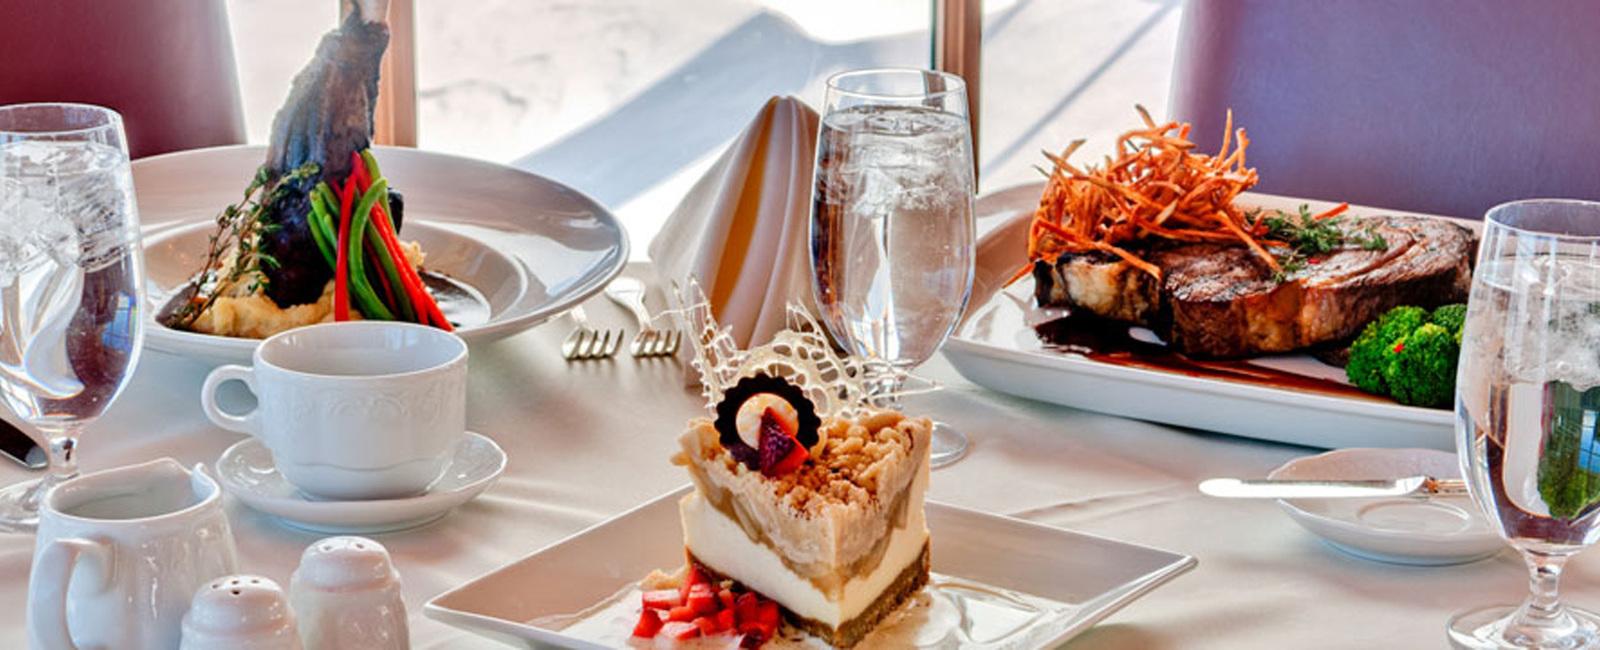 Snowbasin Strawberry Cafe